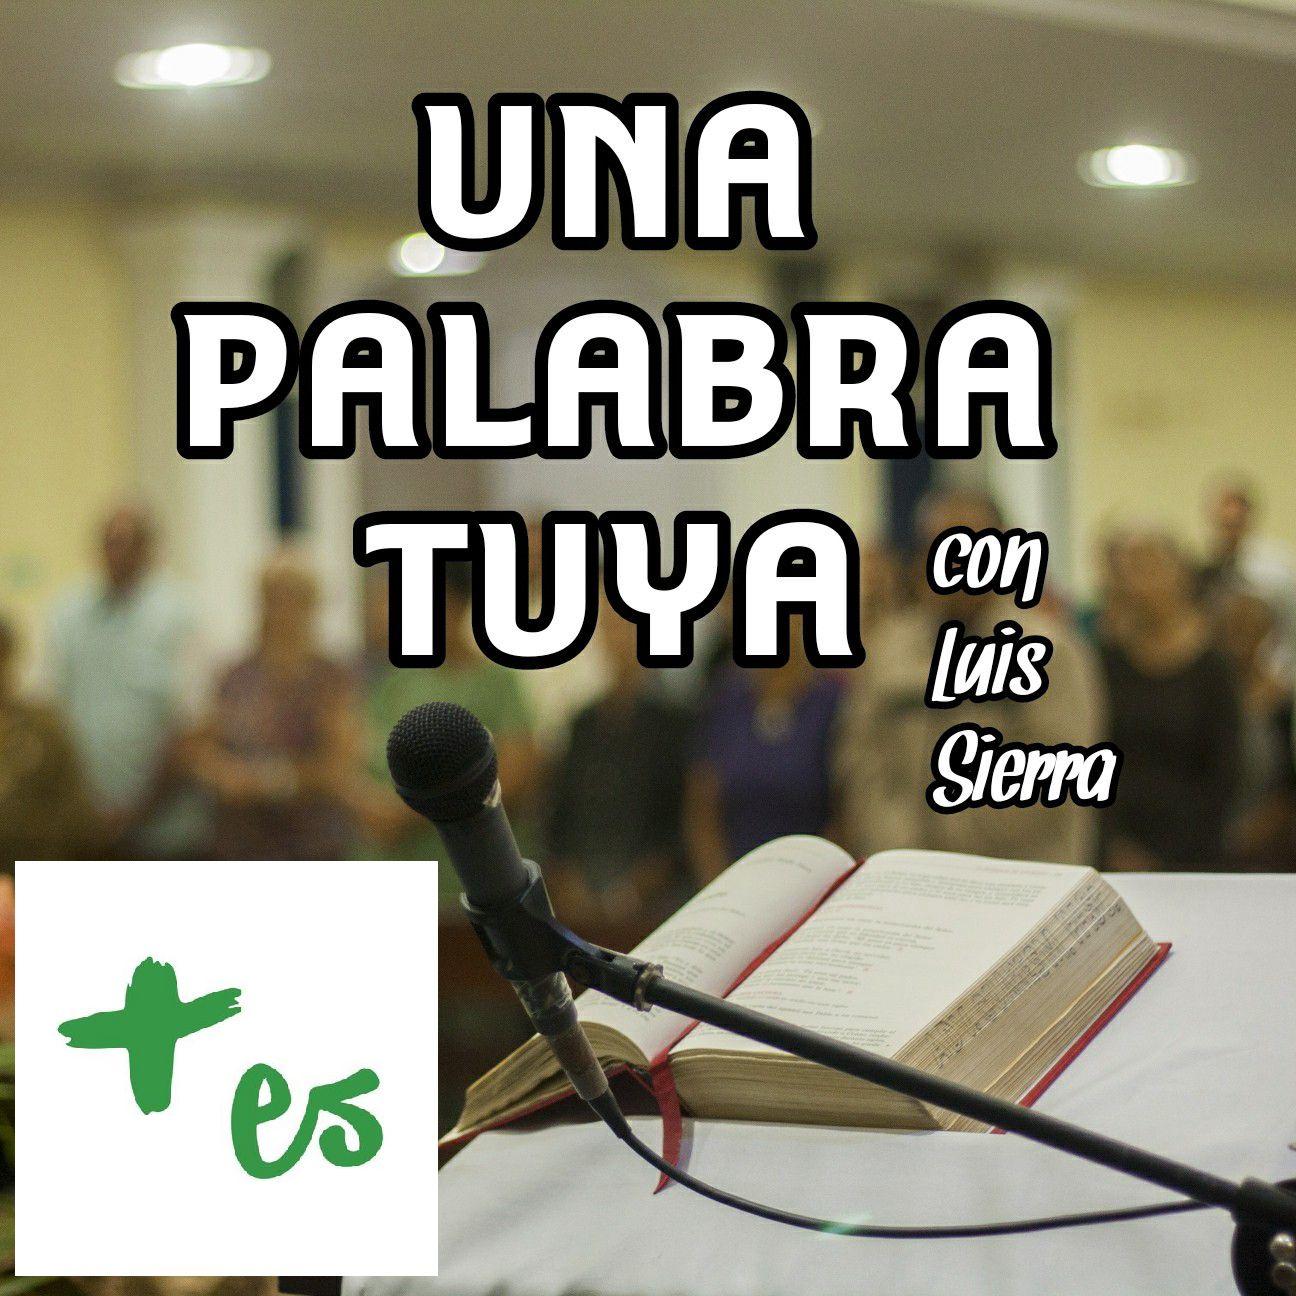 Una Palabra Tuya | 4 JUN 2019